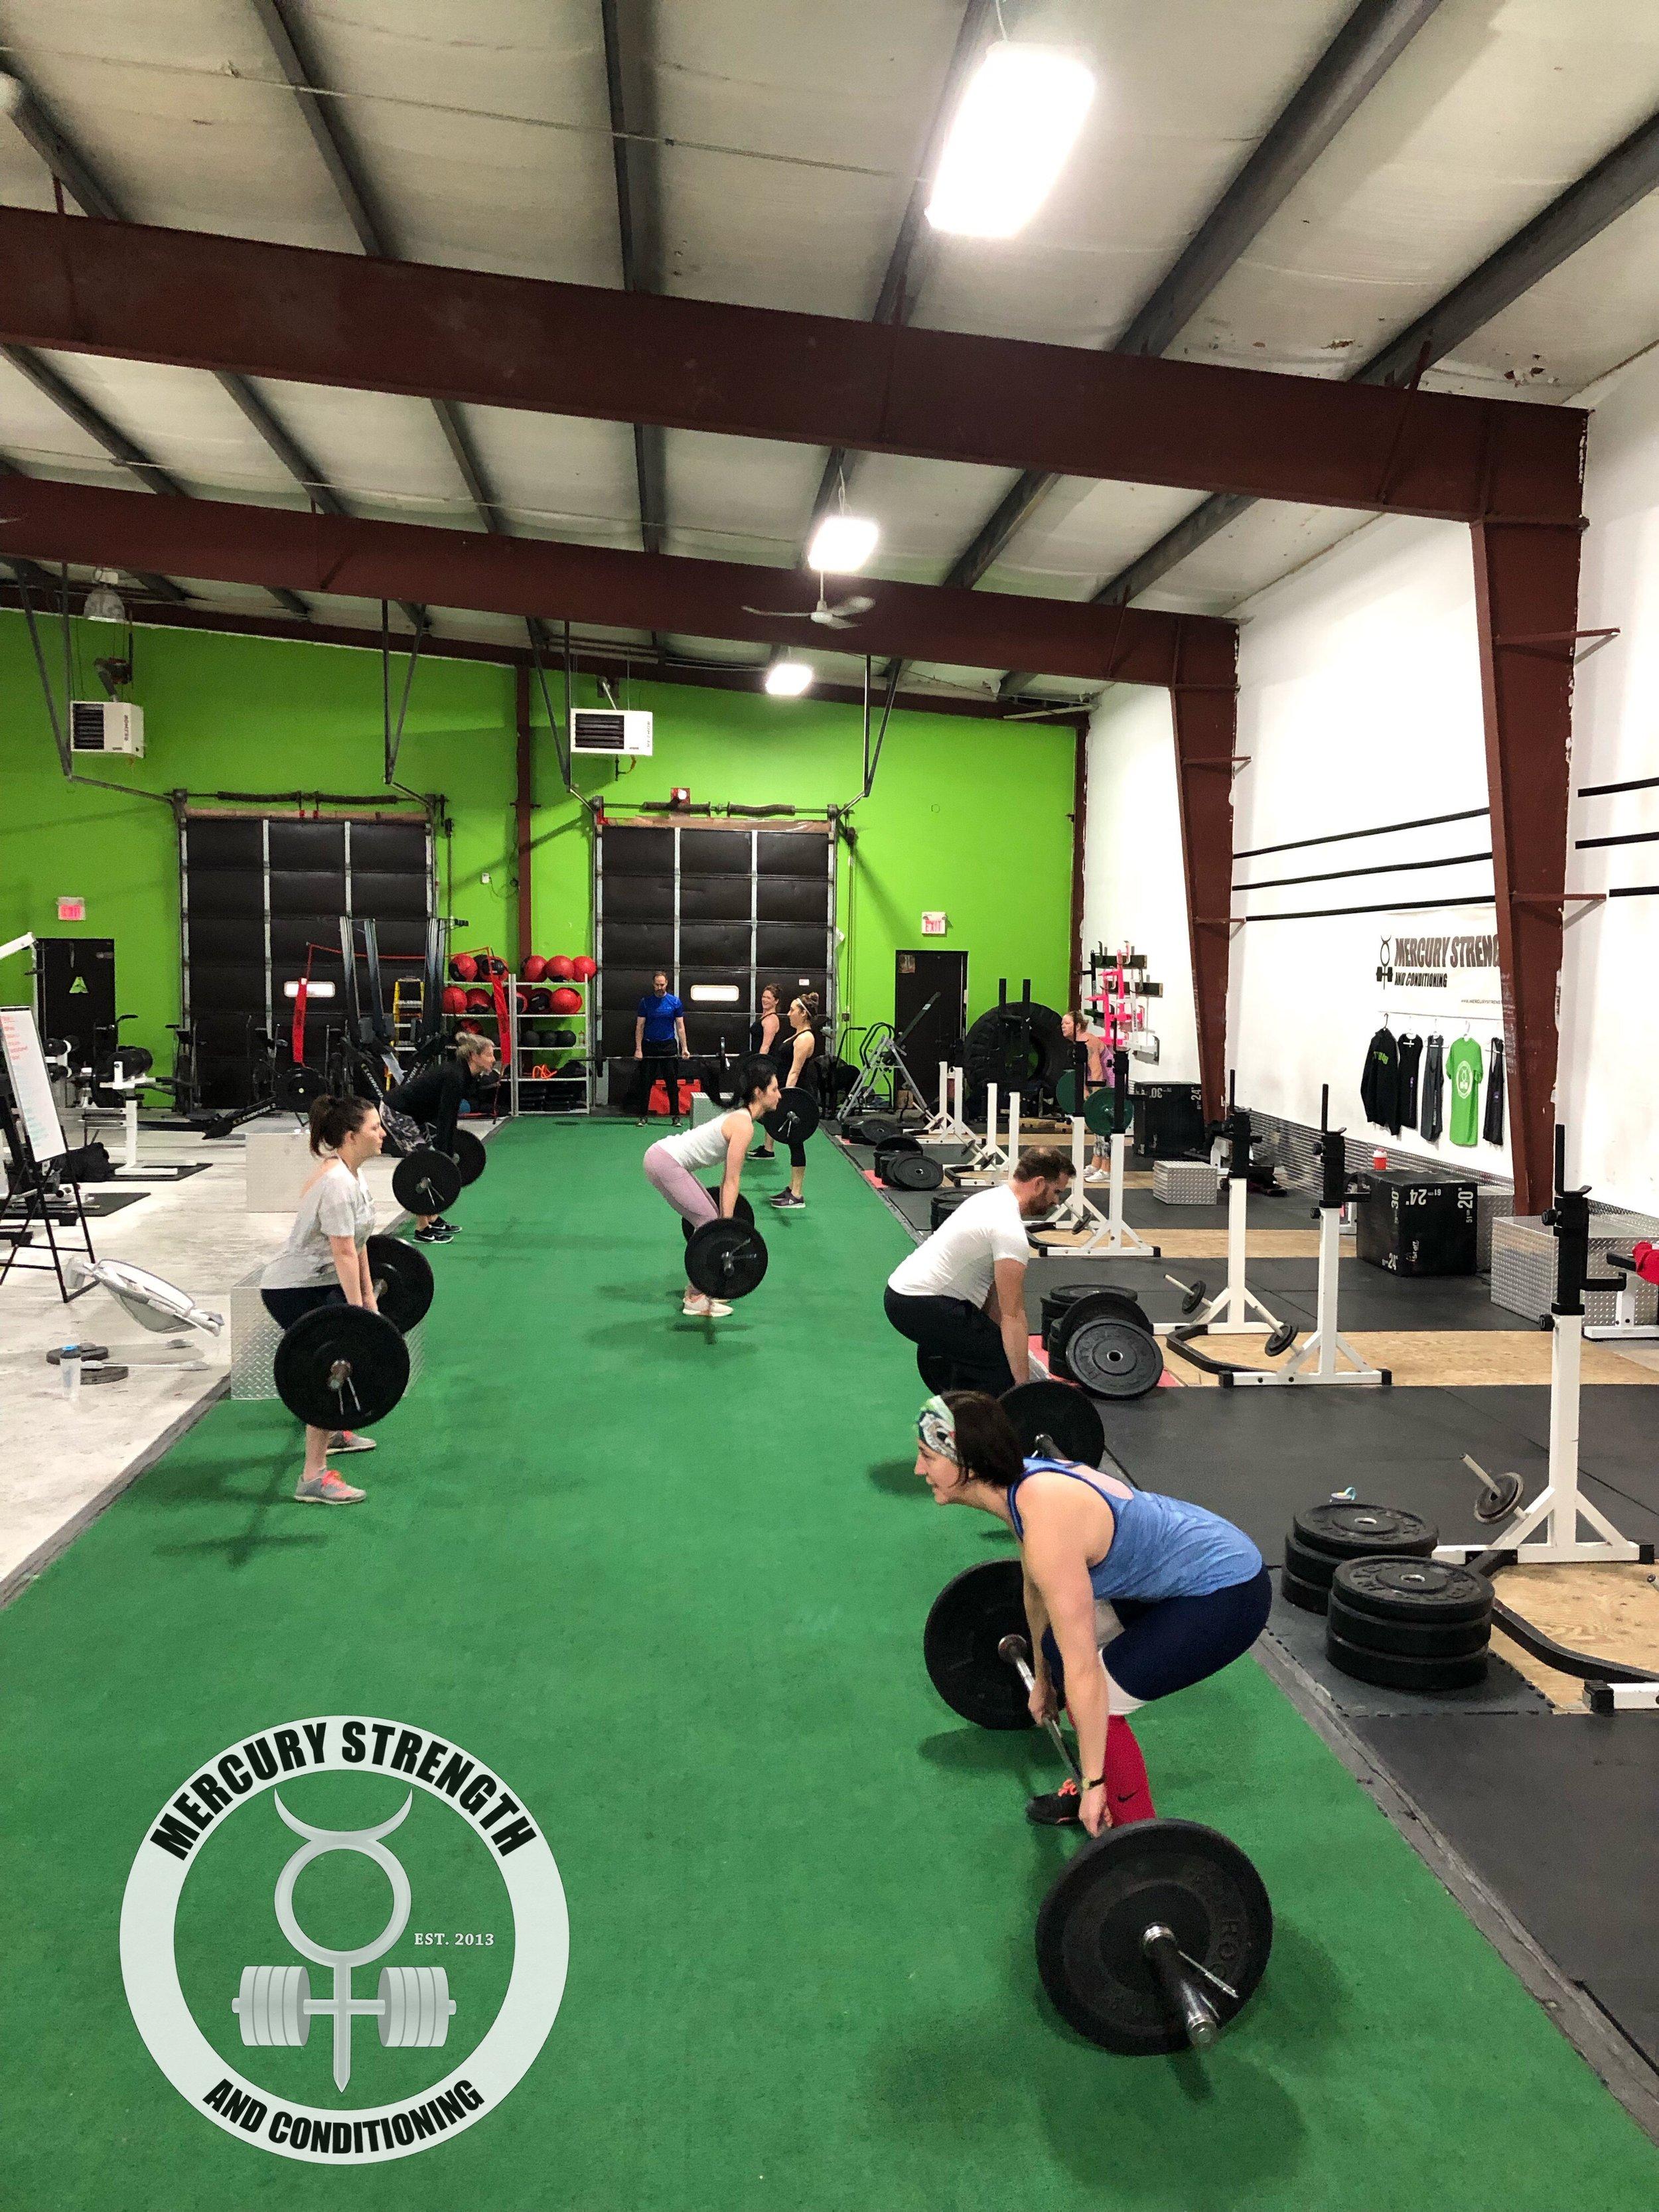 Gym-powerlifting-fitness-personal training-training-bootcamp-crossfit-kingston-kingston gym-kids-mercury-strength-conditioning-athlete-deadlift